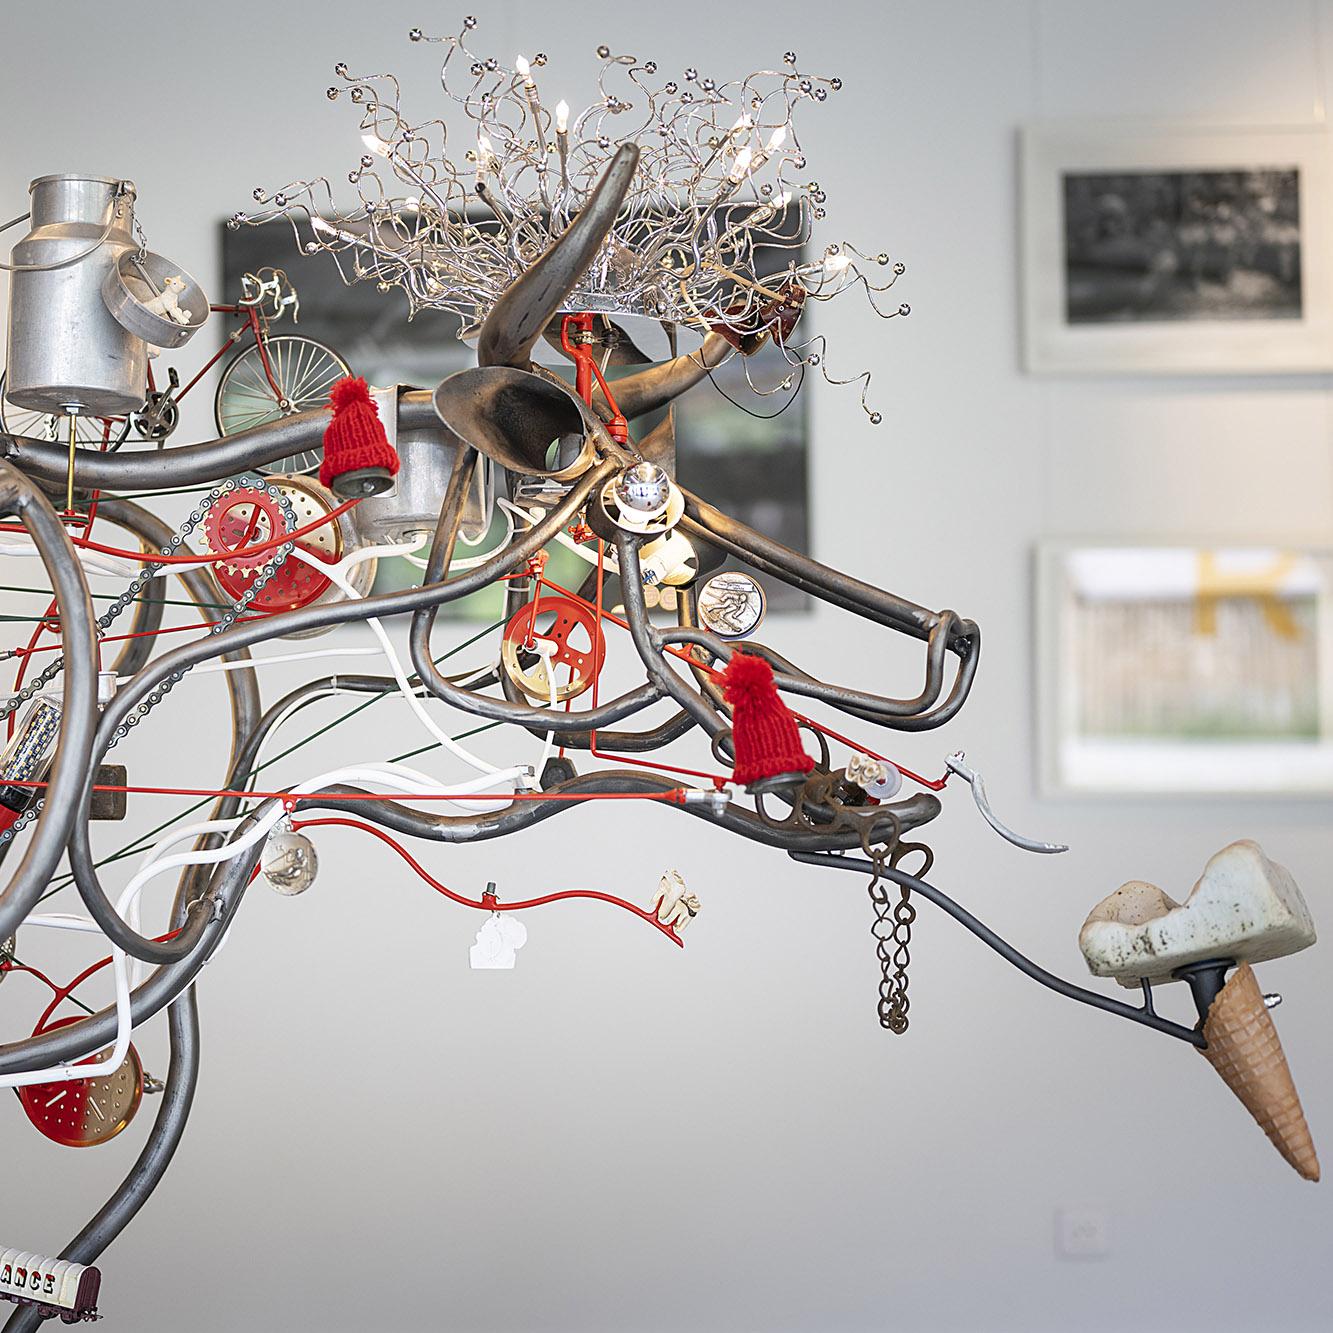 lasource-vachecinetique-exposition-art-activite-culture-legrandbornand - © T. Vattard